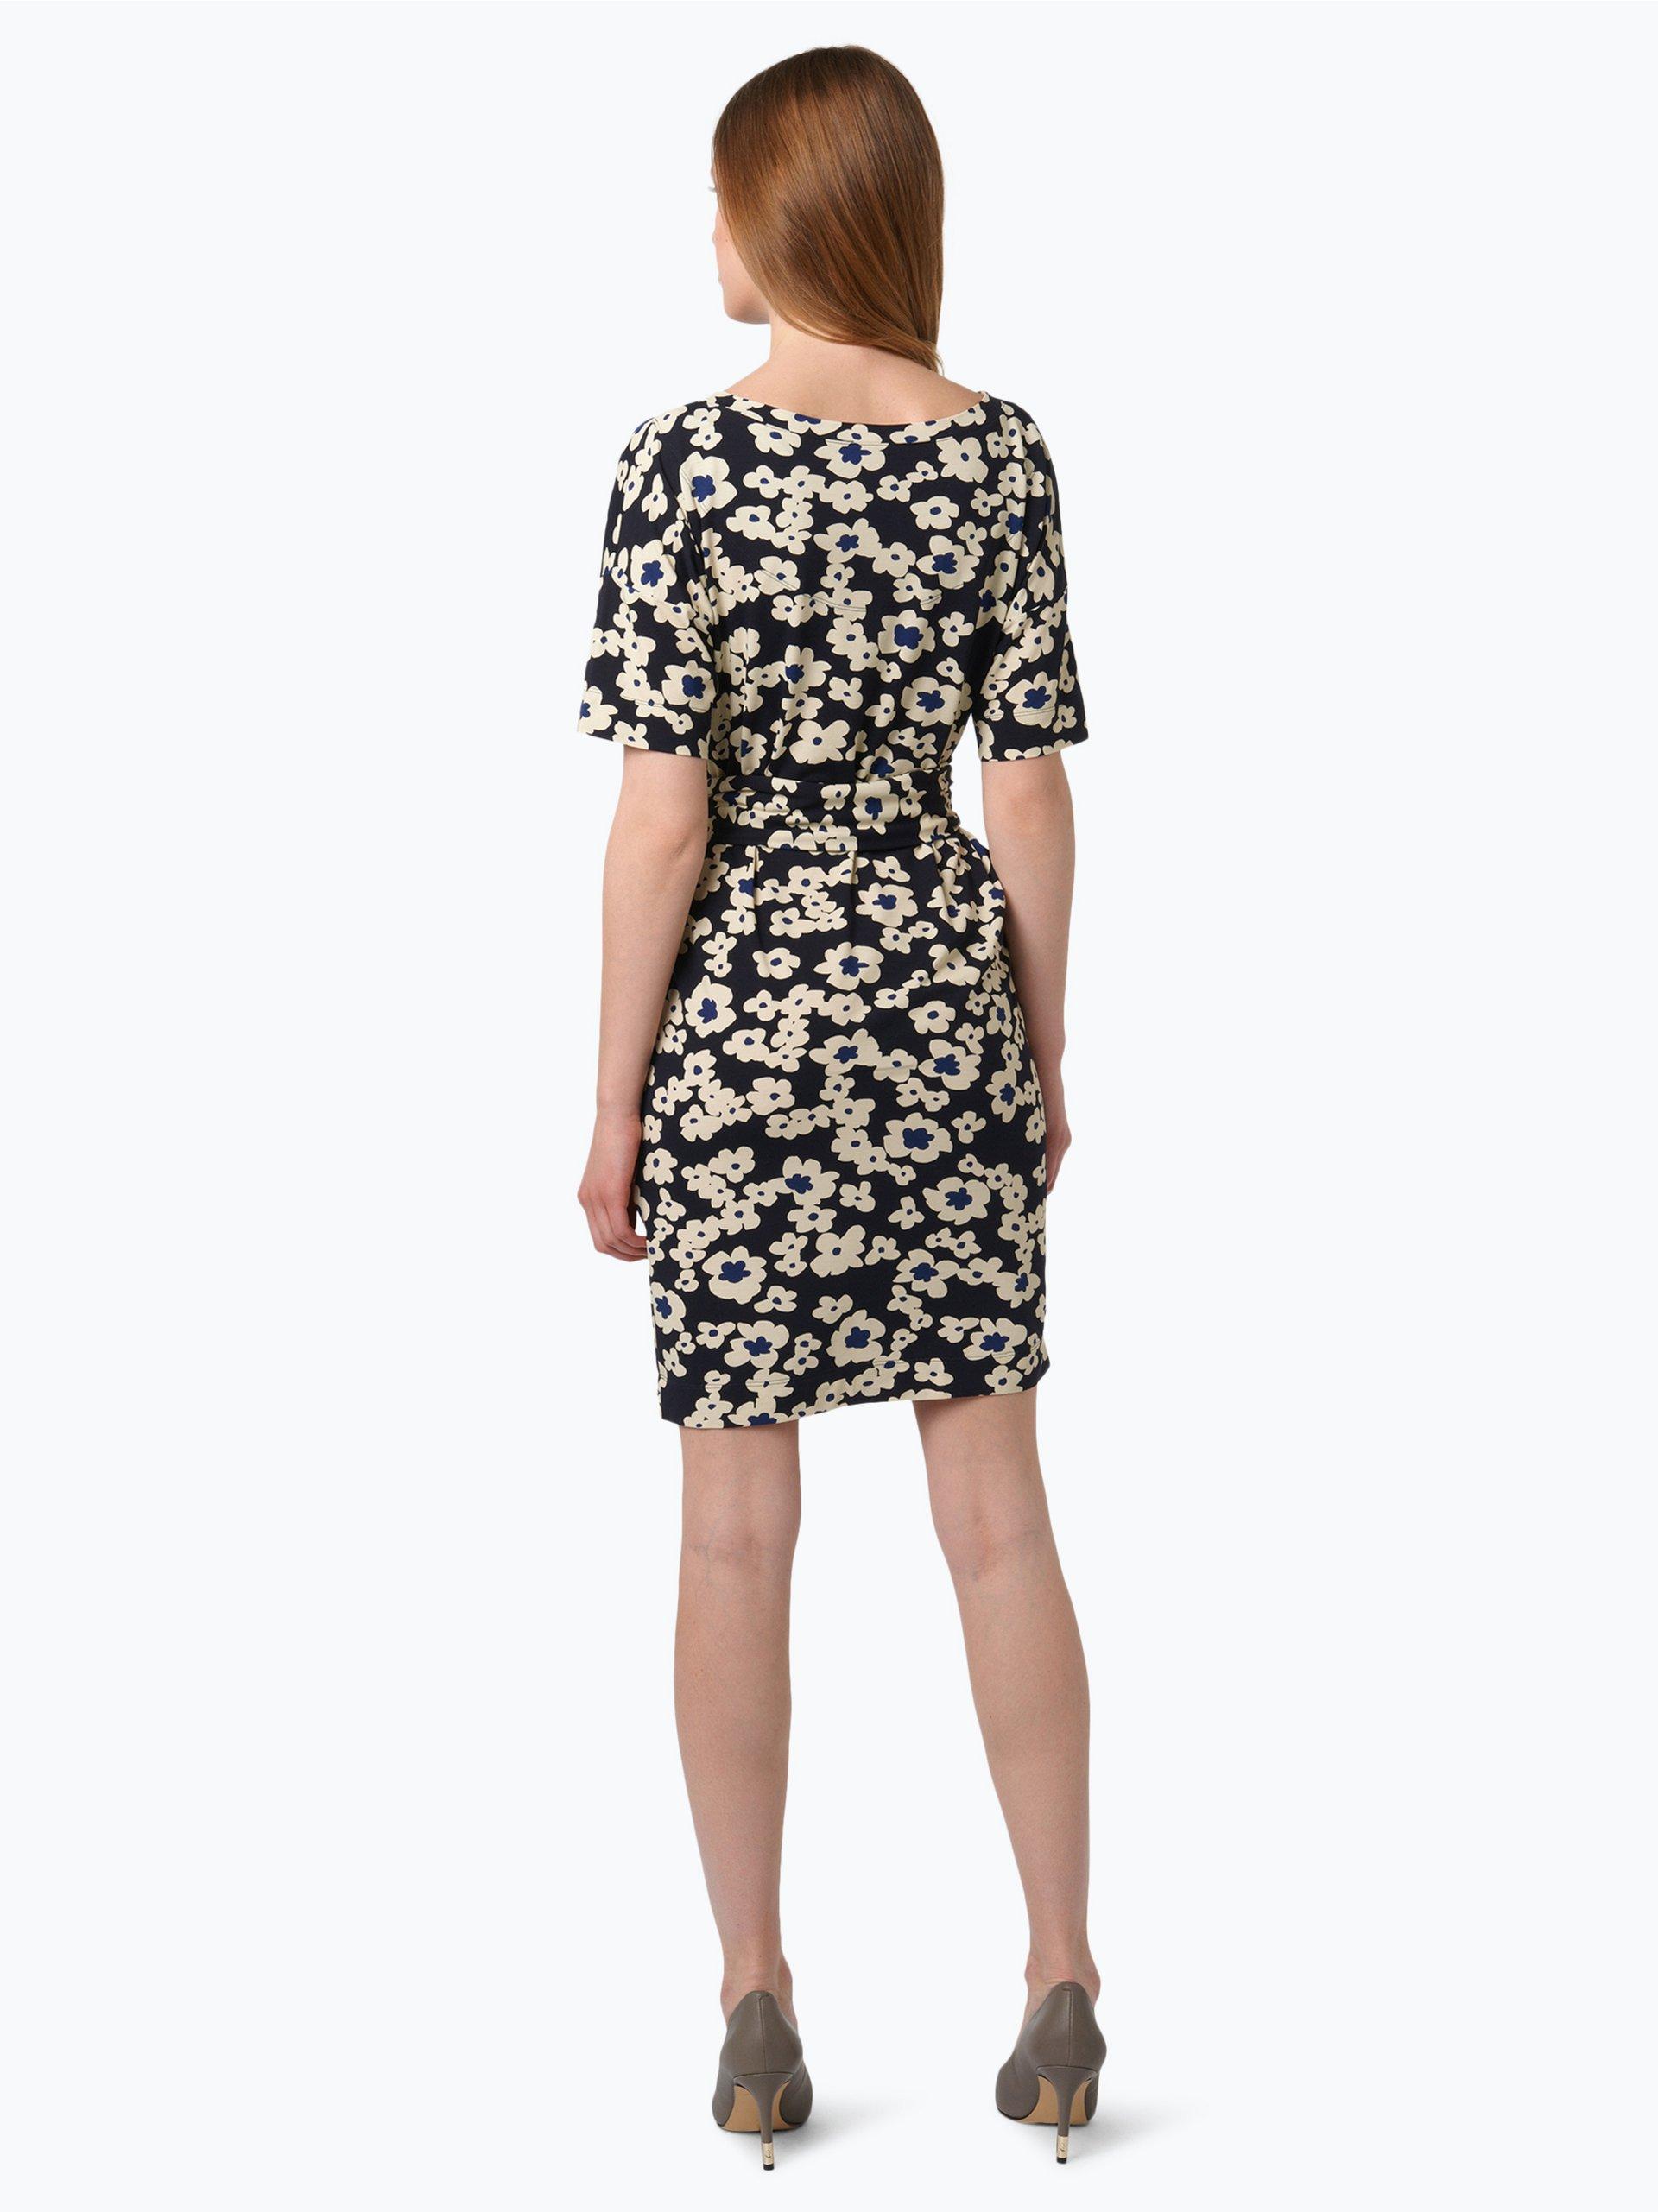 marc cain additions kleider wei gemustert online kaufen vangraaf com